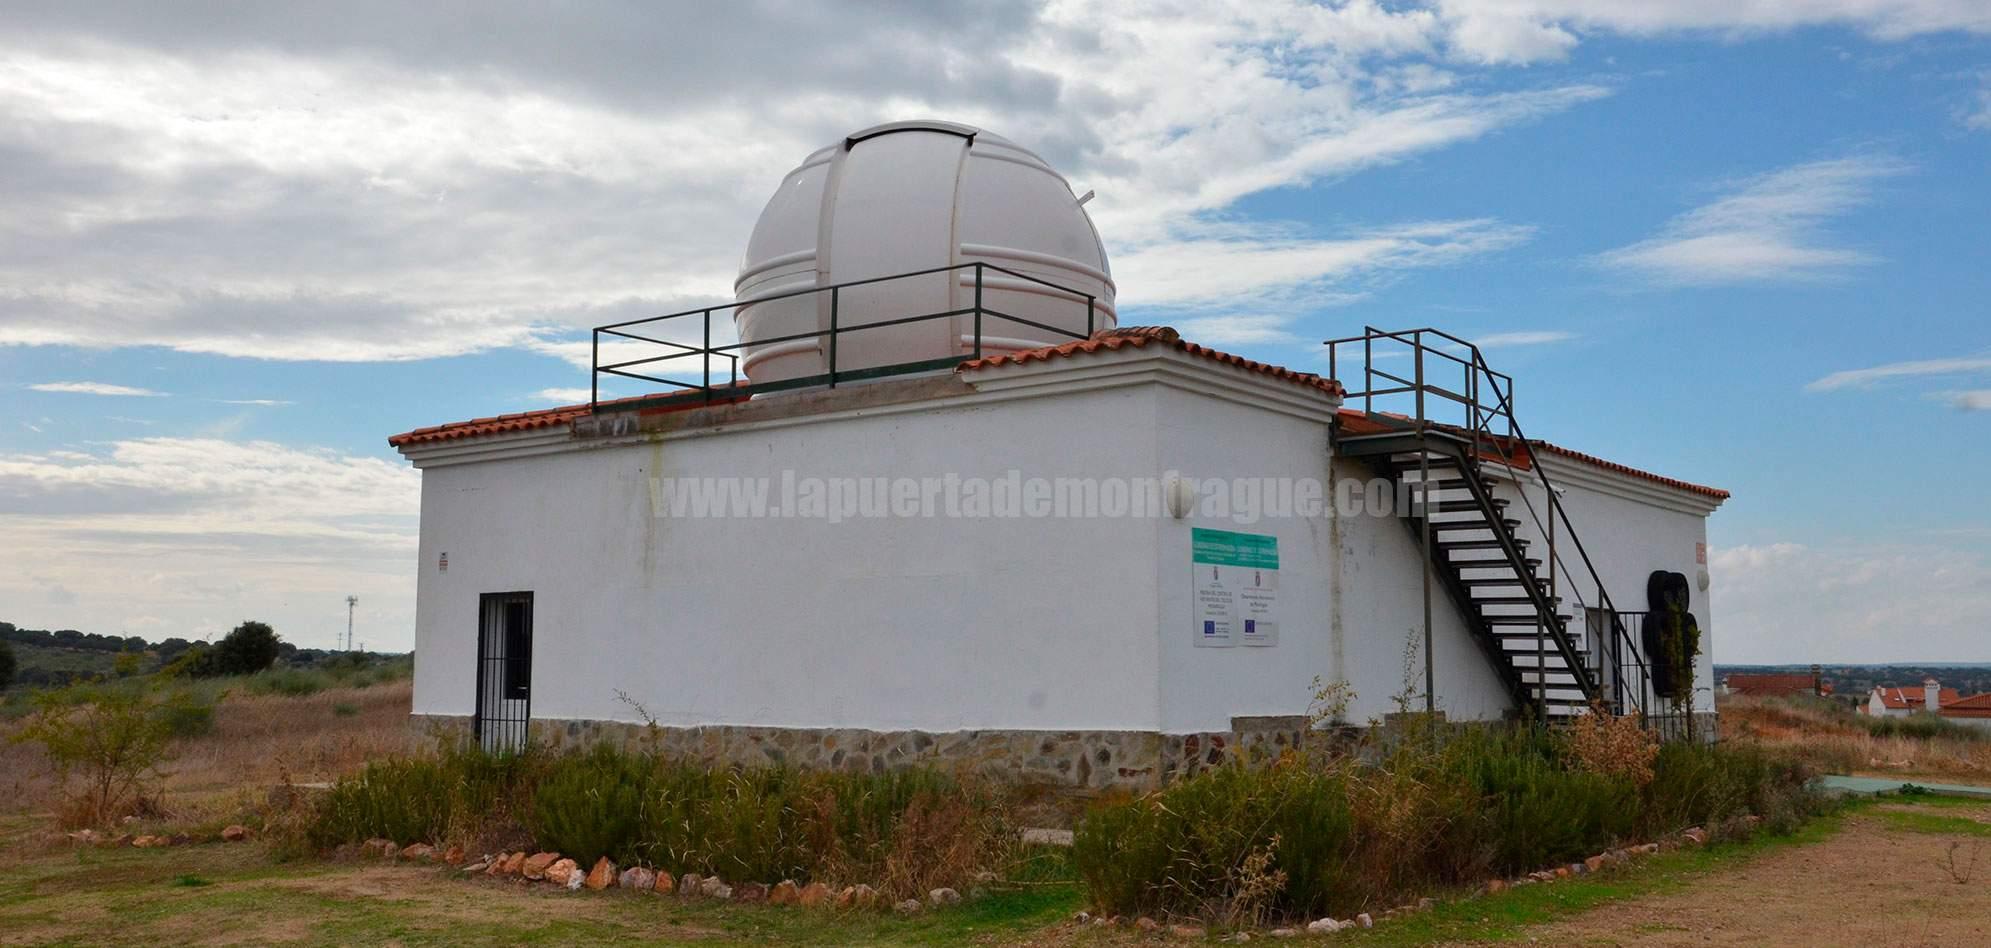 Observatorio Astronómico Monfragüe